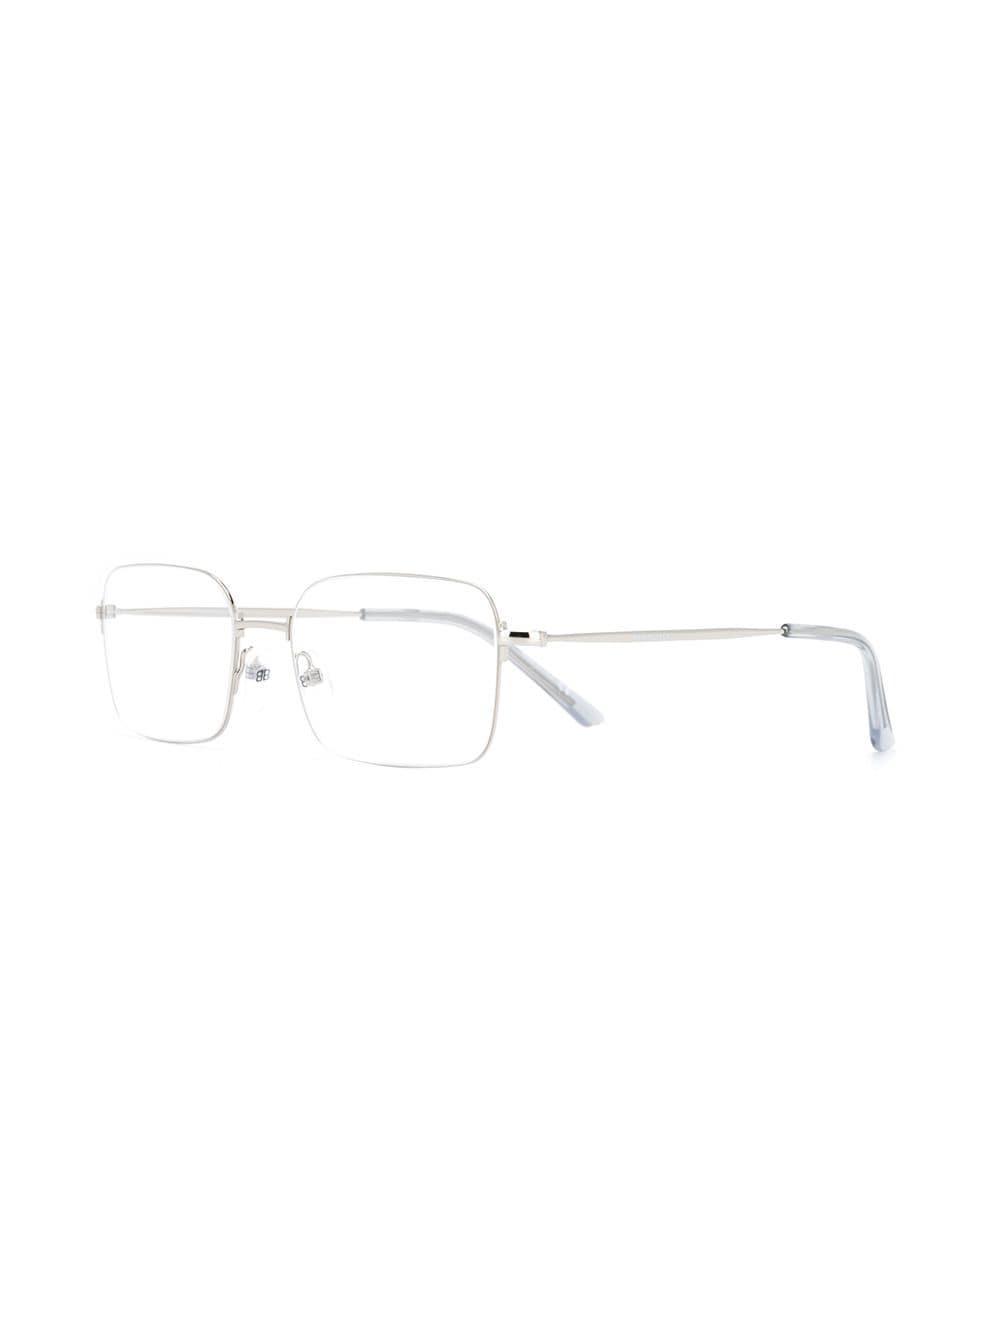 7df28ef7671 Balenciaga - Metallic Square-frame Glasses for Men - Lyst. View fullscreen